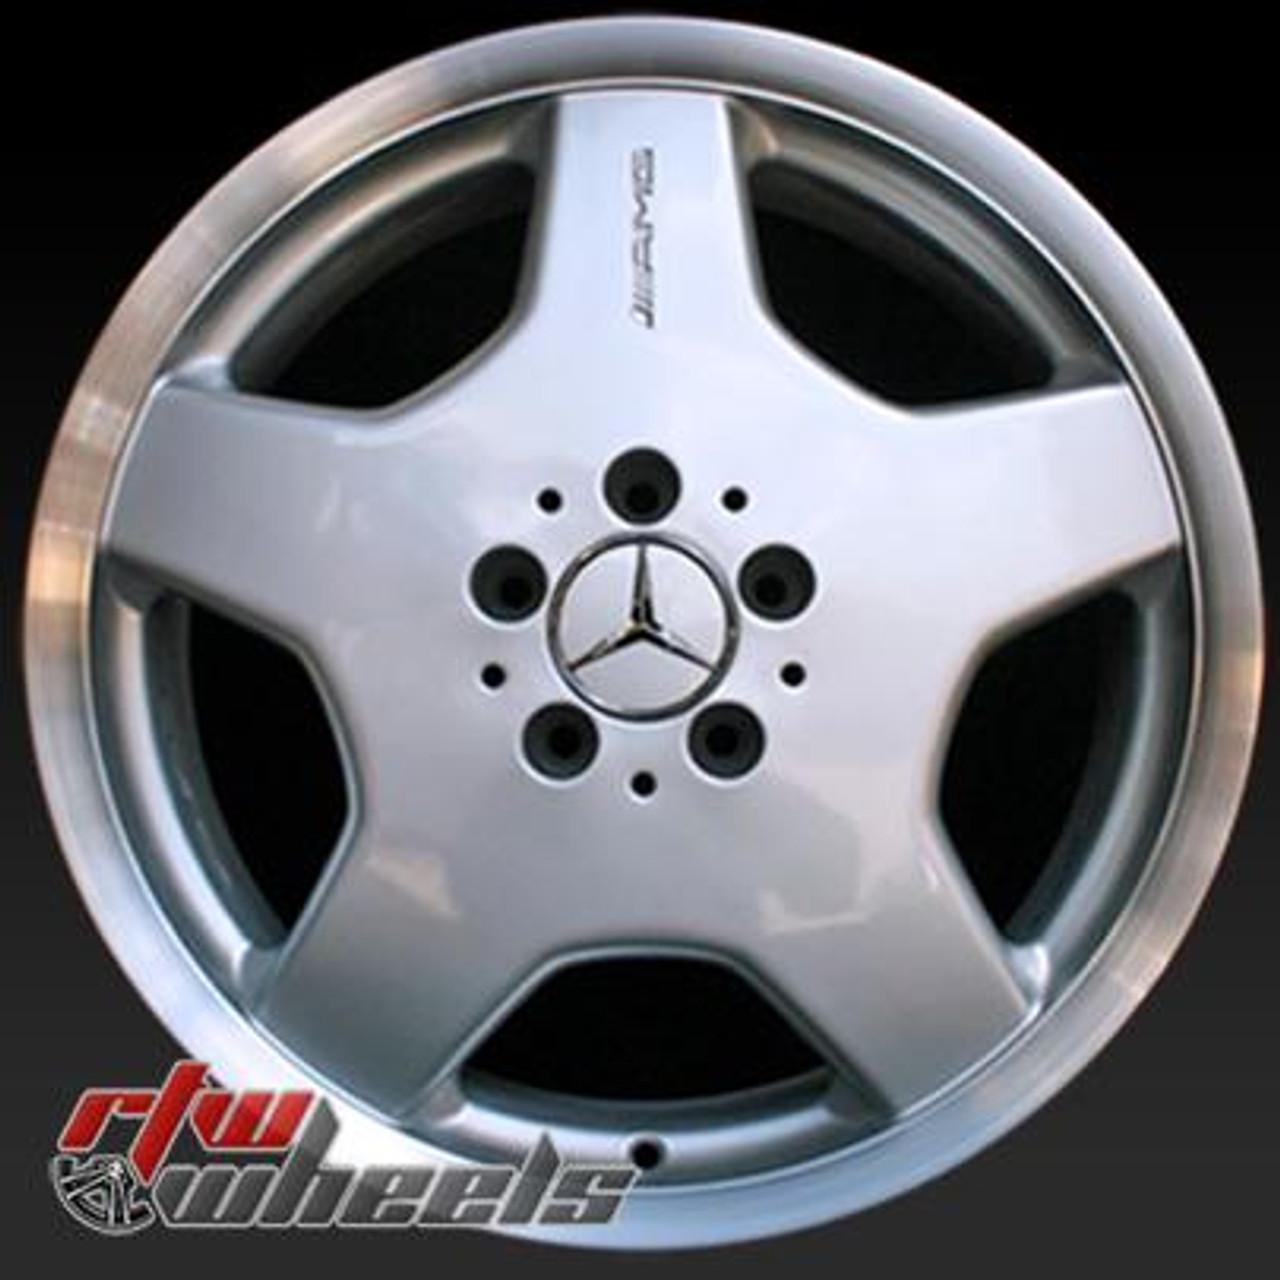 Mercedes Benz Rims >> Mercedes Benz Wheels For Sale 2000 2004 18 Rear Amg Silver Rims 65207